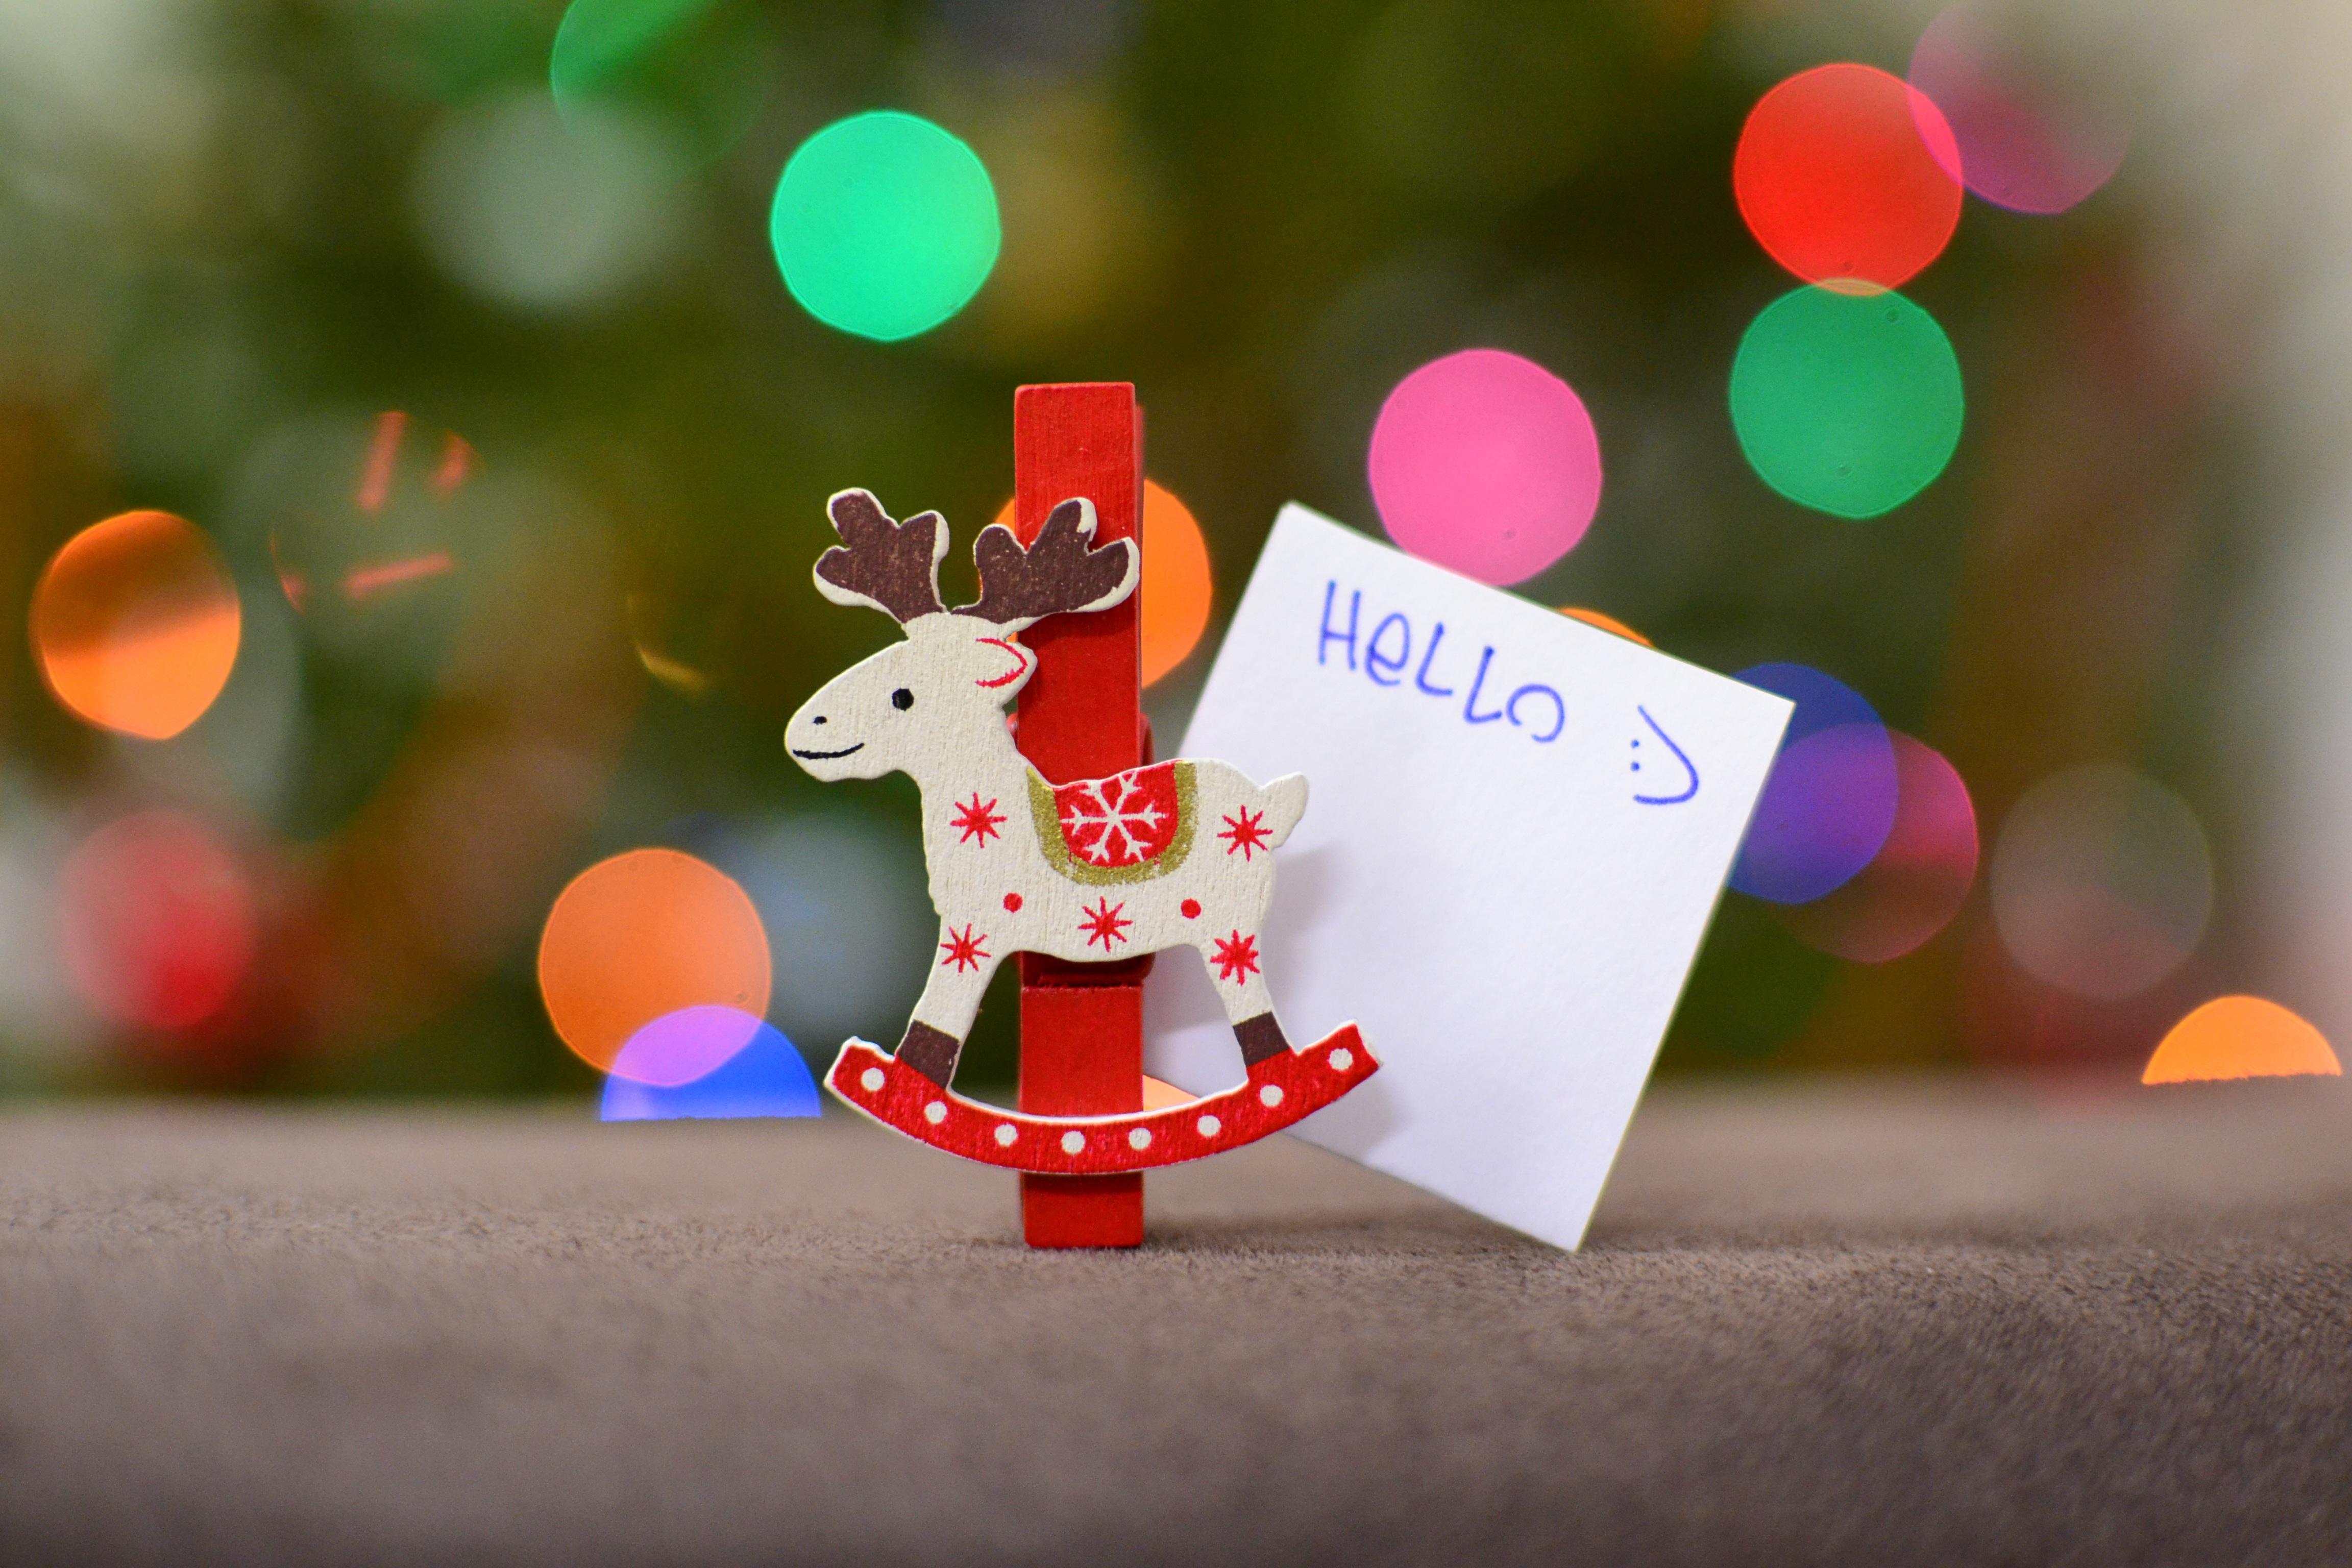 Free Images Holiday Toy Season Christmas Decoration